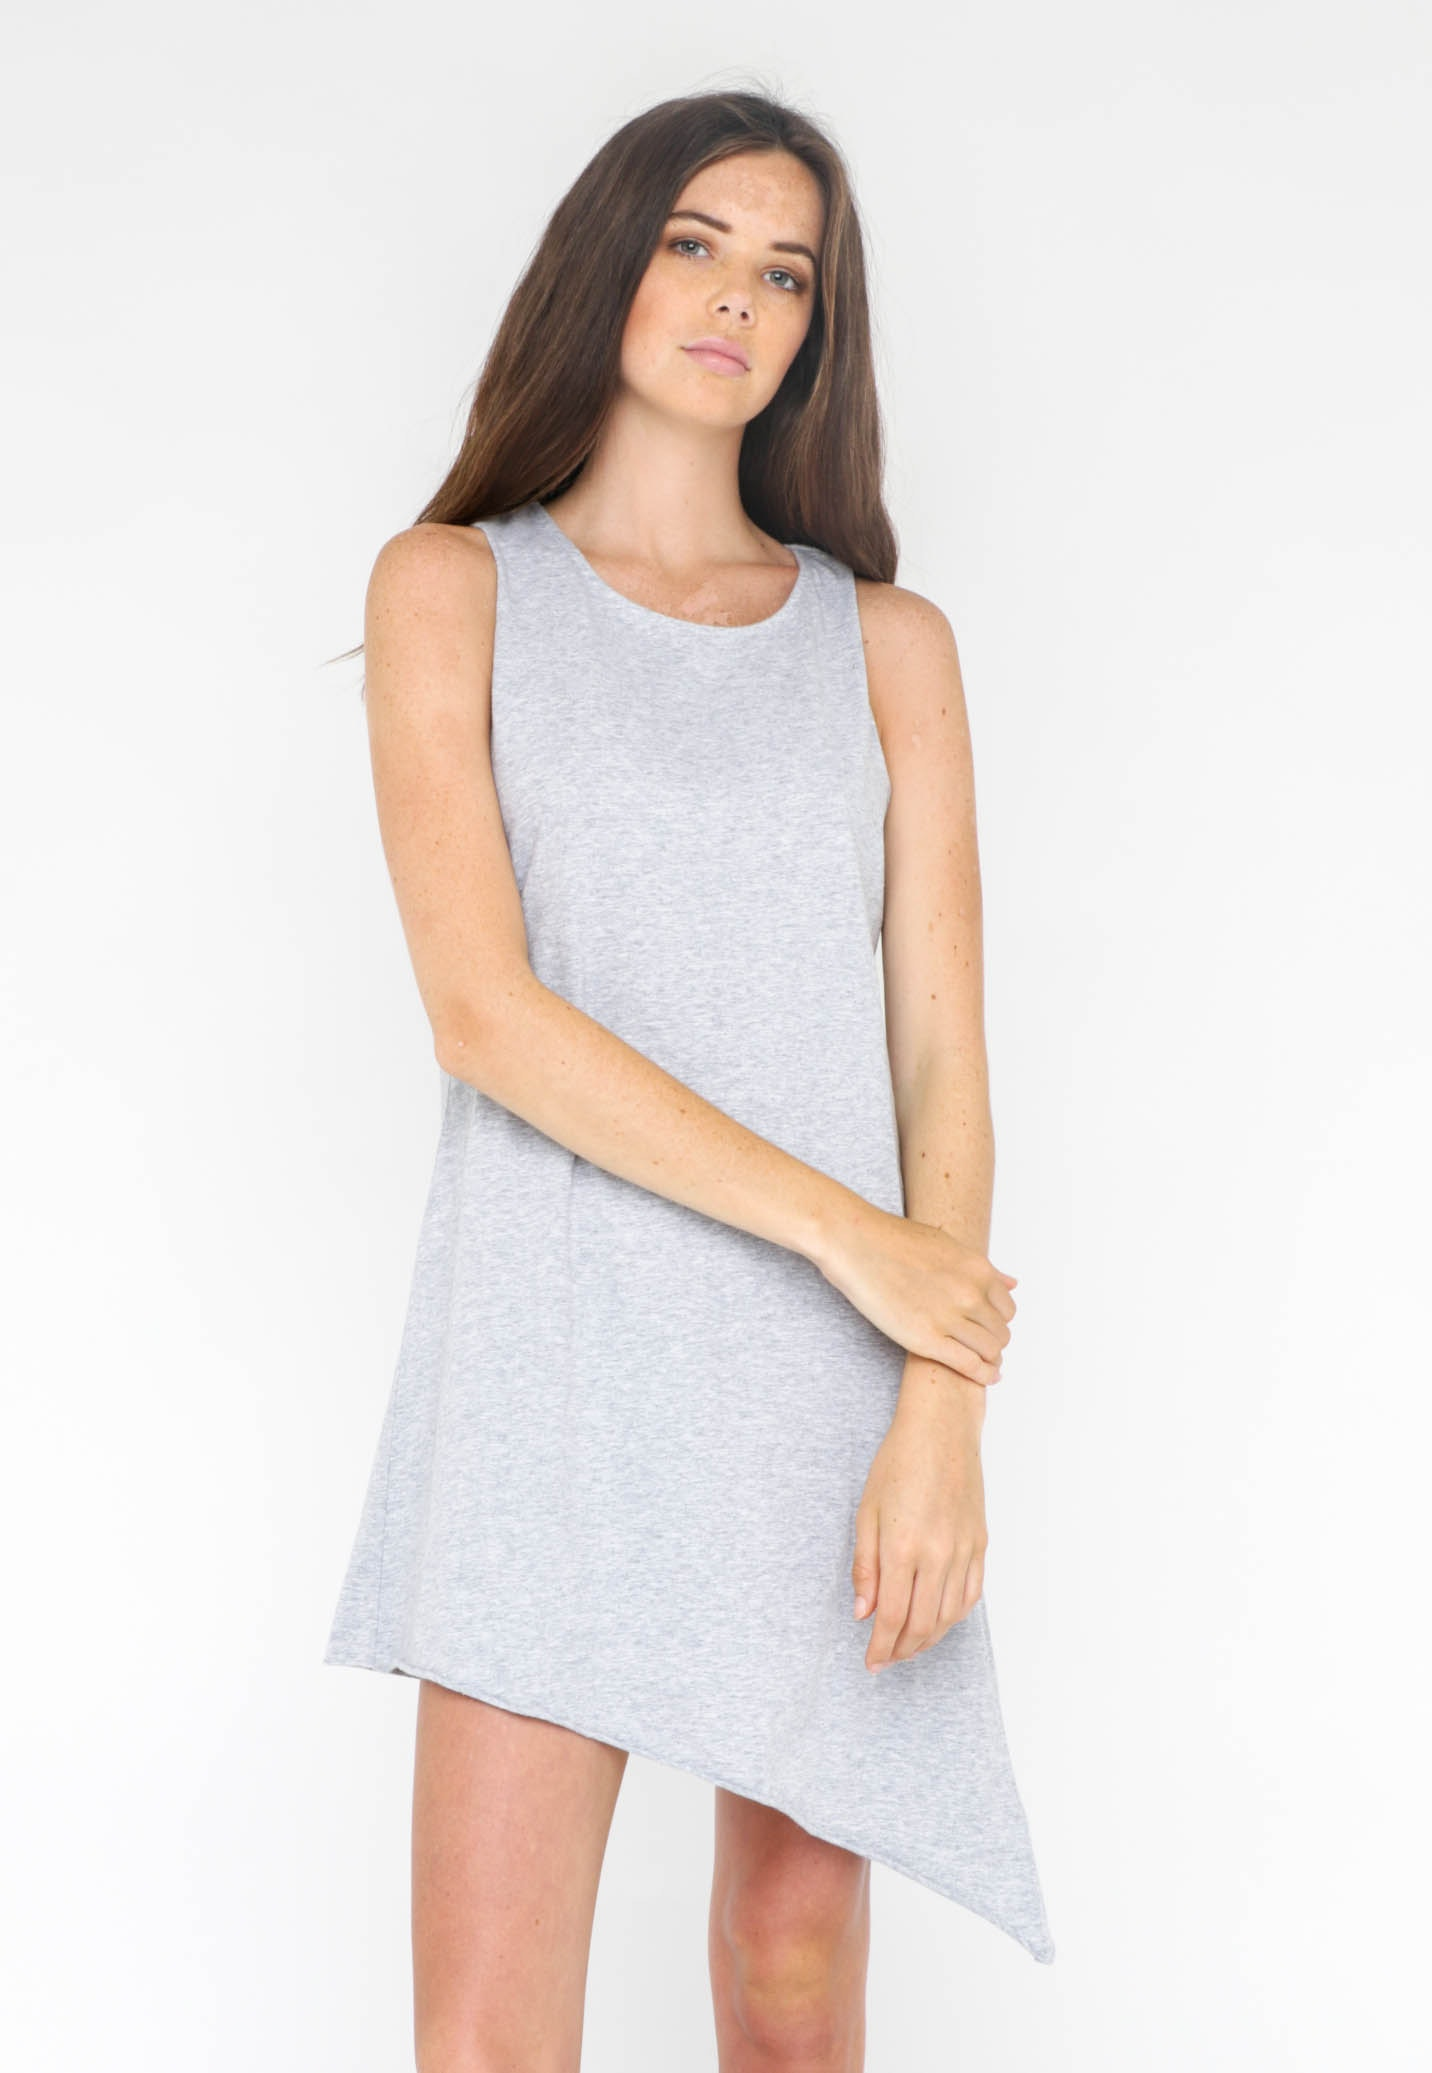 Silent Theory - Leo Mini Dress - Grey